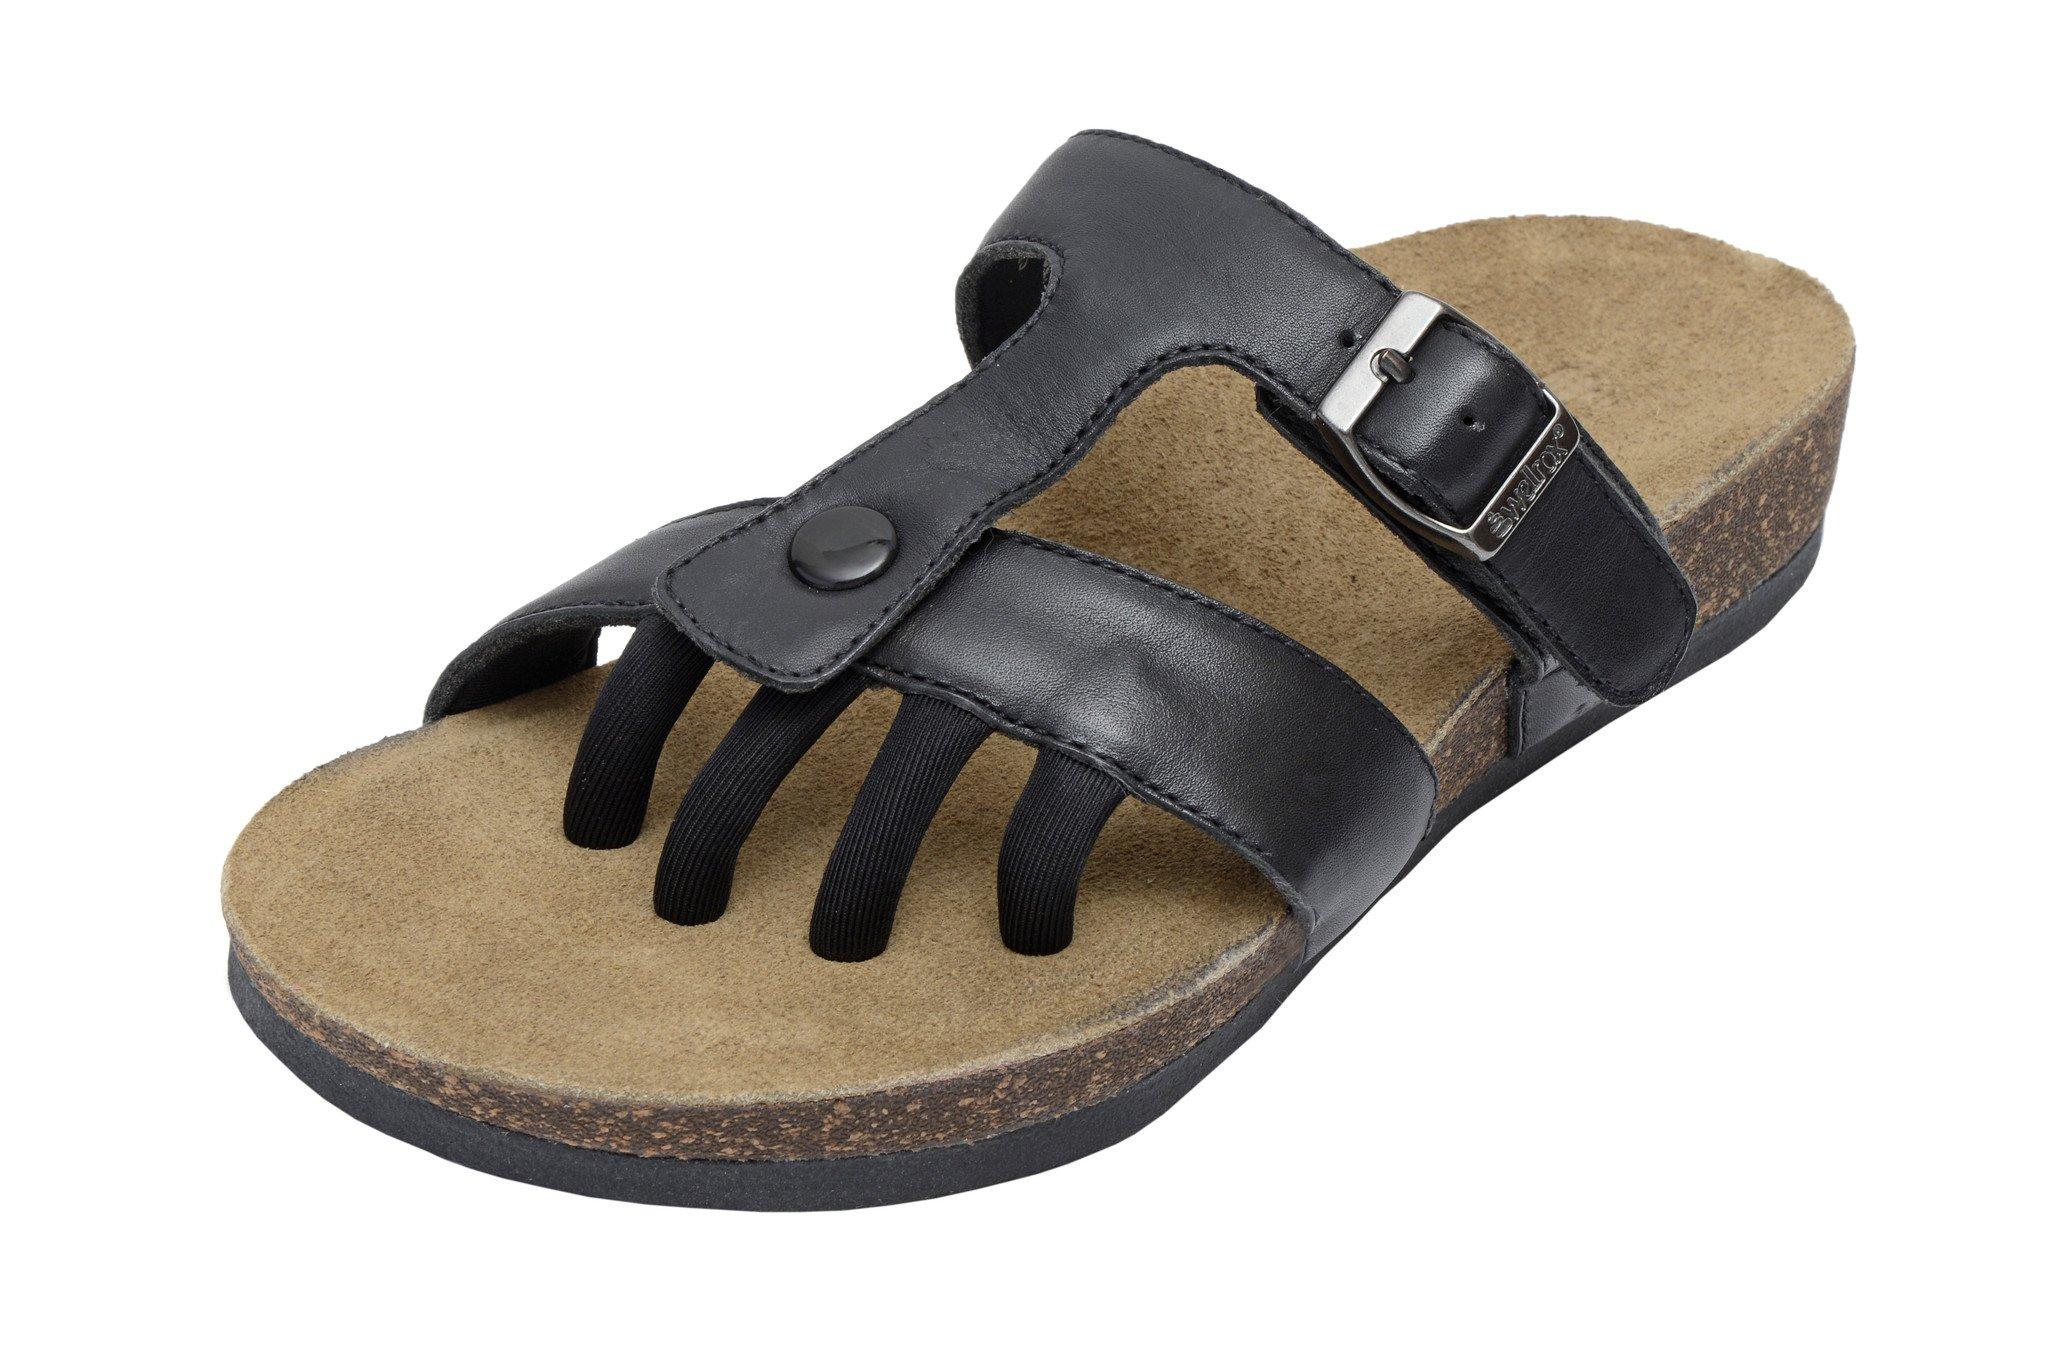 549dcadefa86 WELLROX Women s Black Nappa Santa Fe Sedona Toe-Separator Wellness Sandals  Sz 6